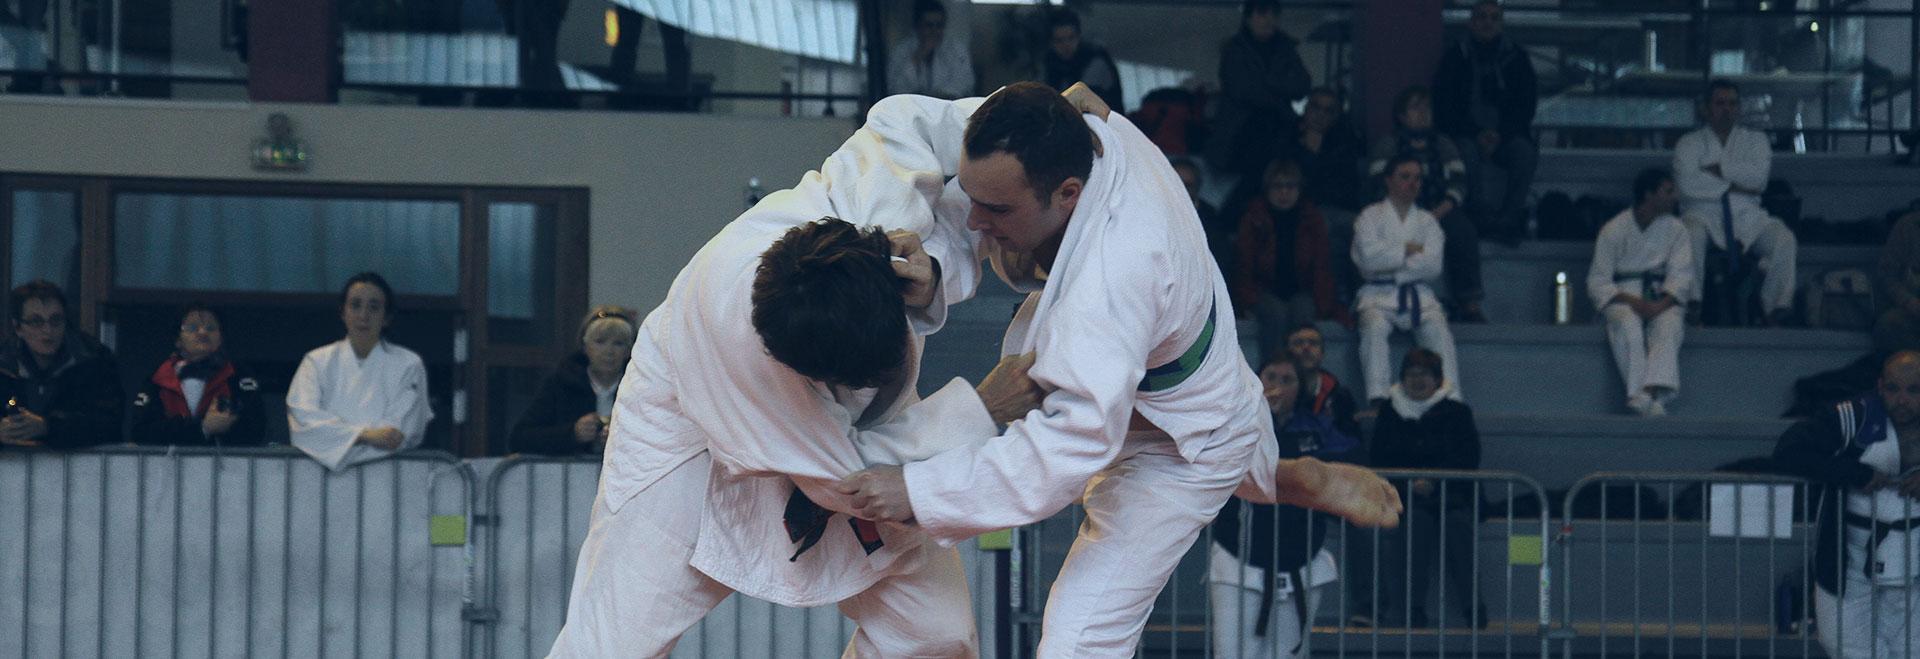 Judo Handicap Ligue du Sport Adapté Auvergne Rhône-Alpes